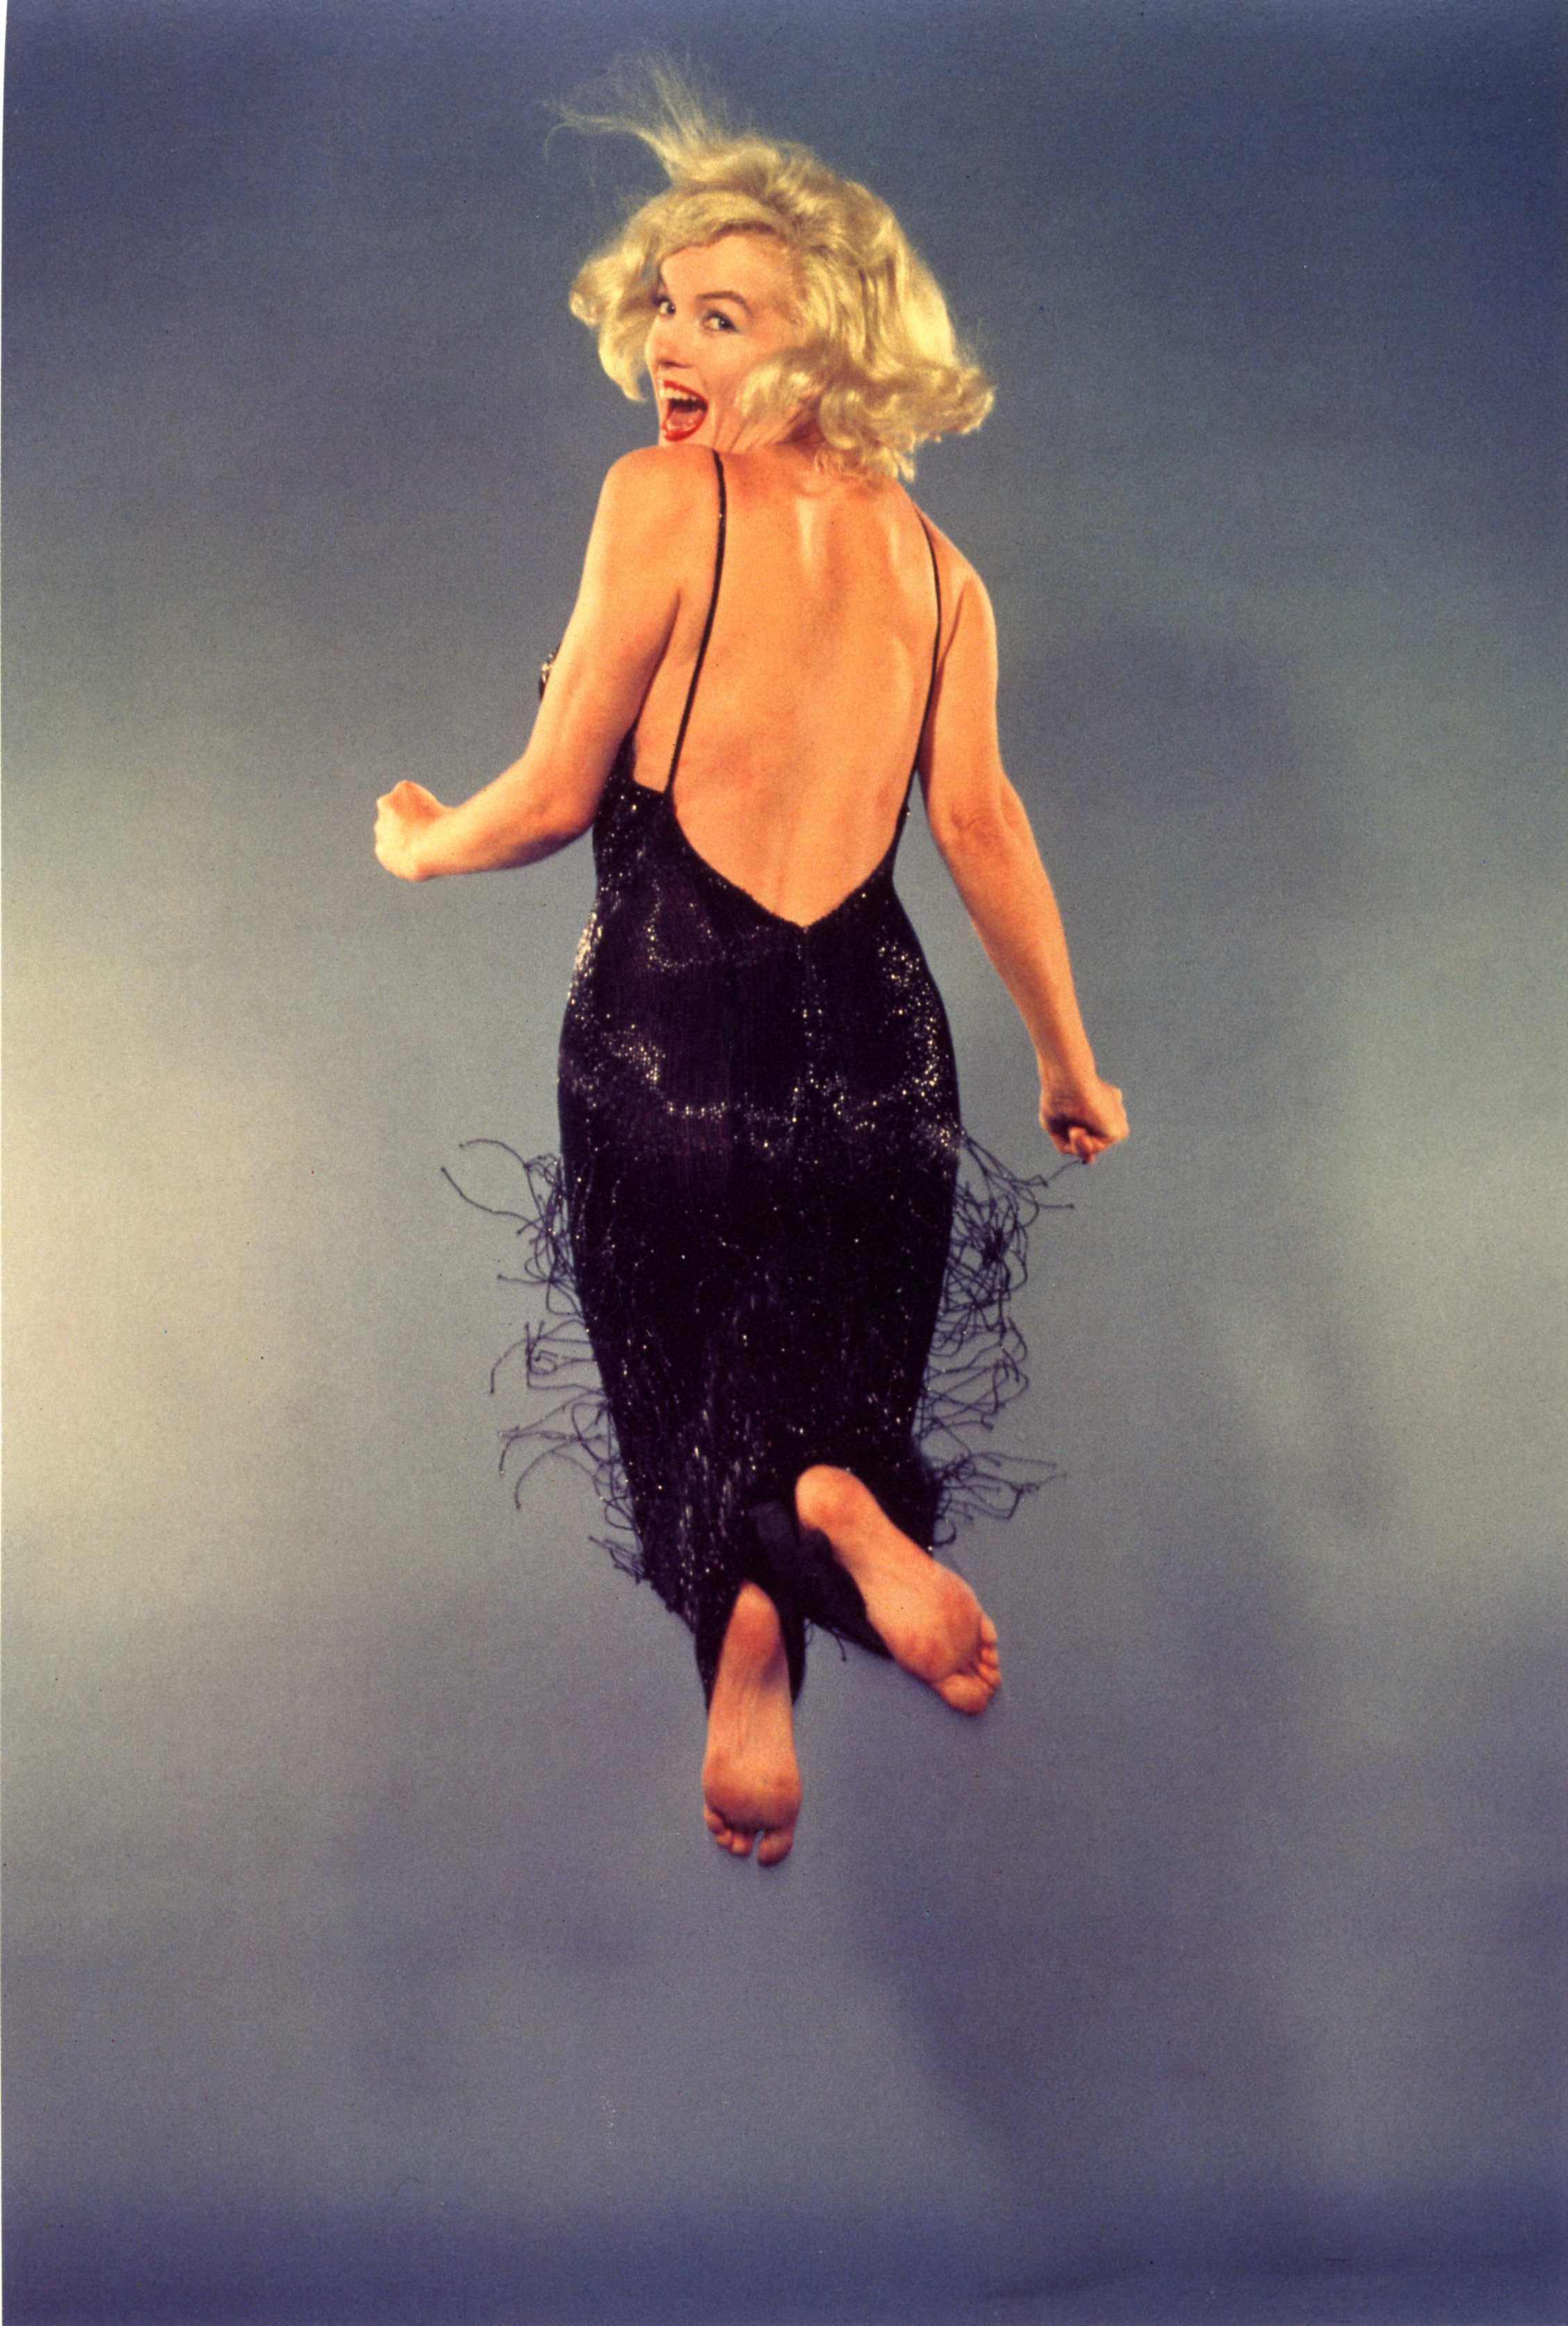 Biography: Portrait Philippe halsman fashion photography